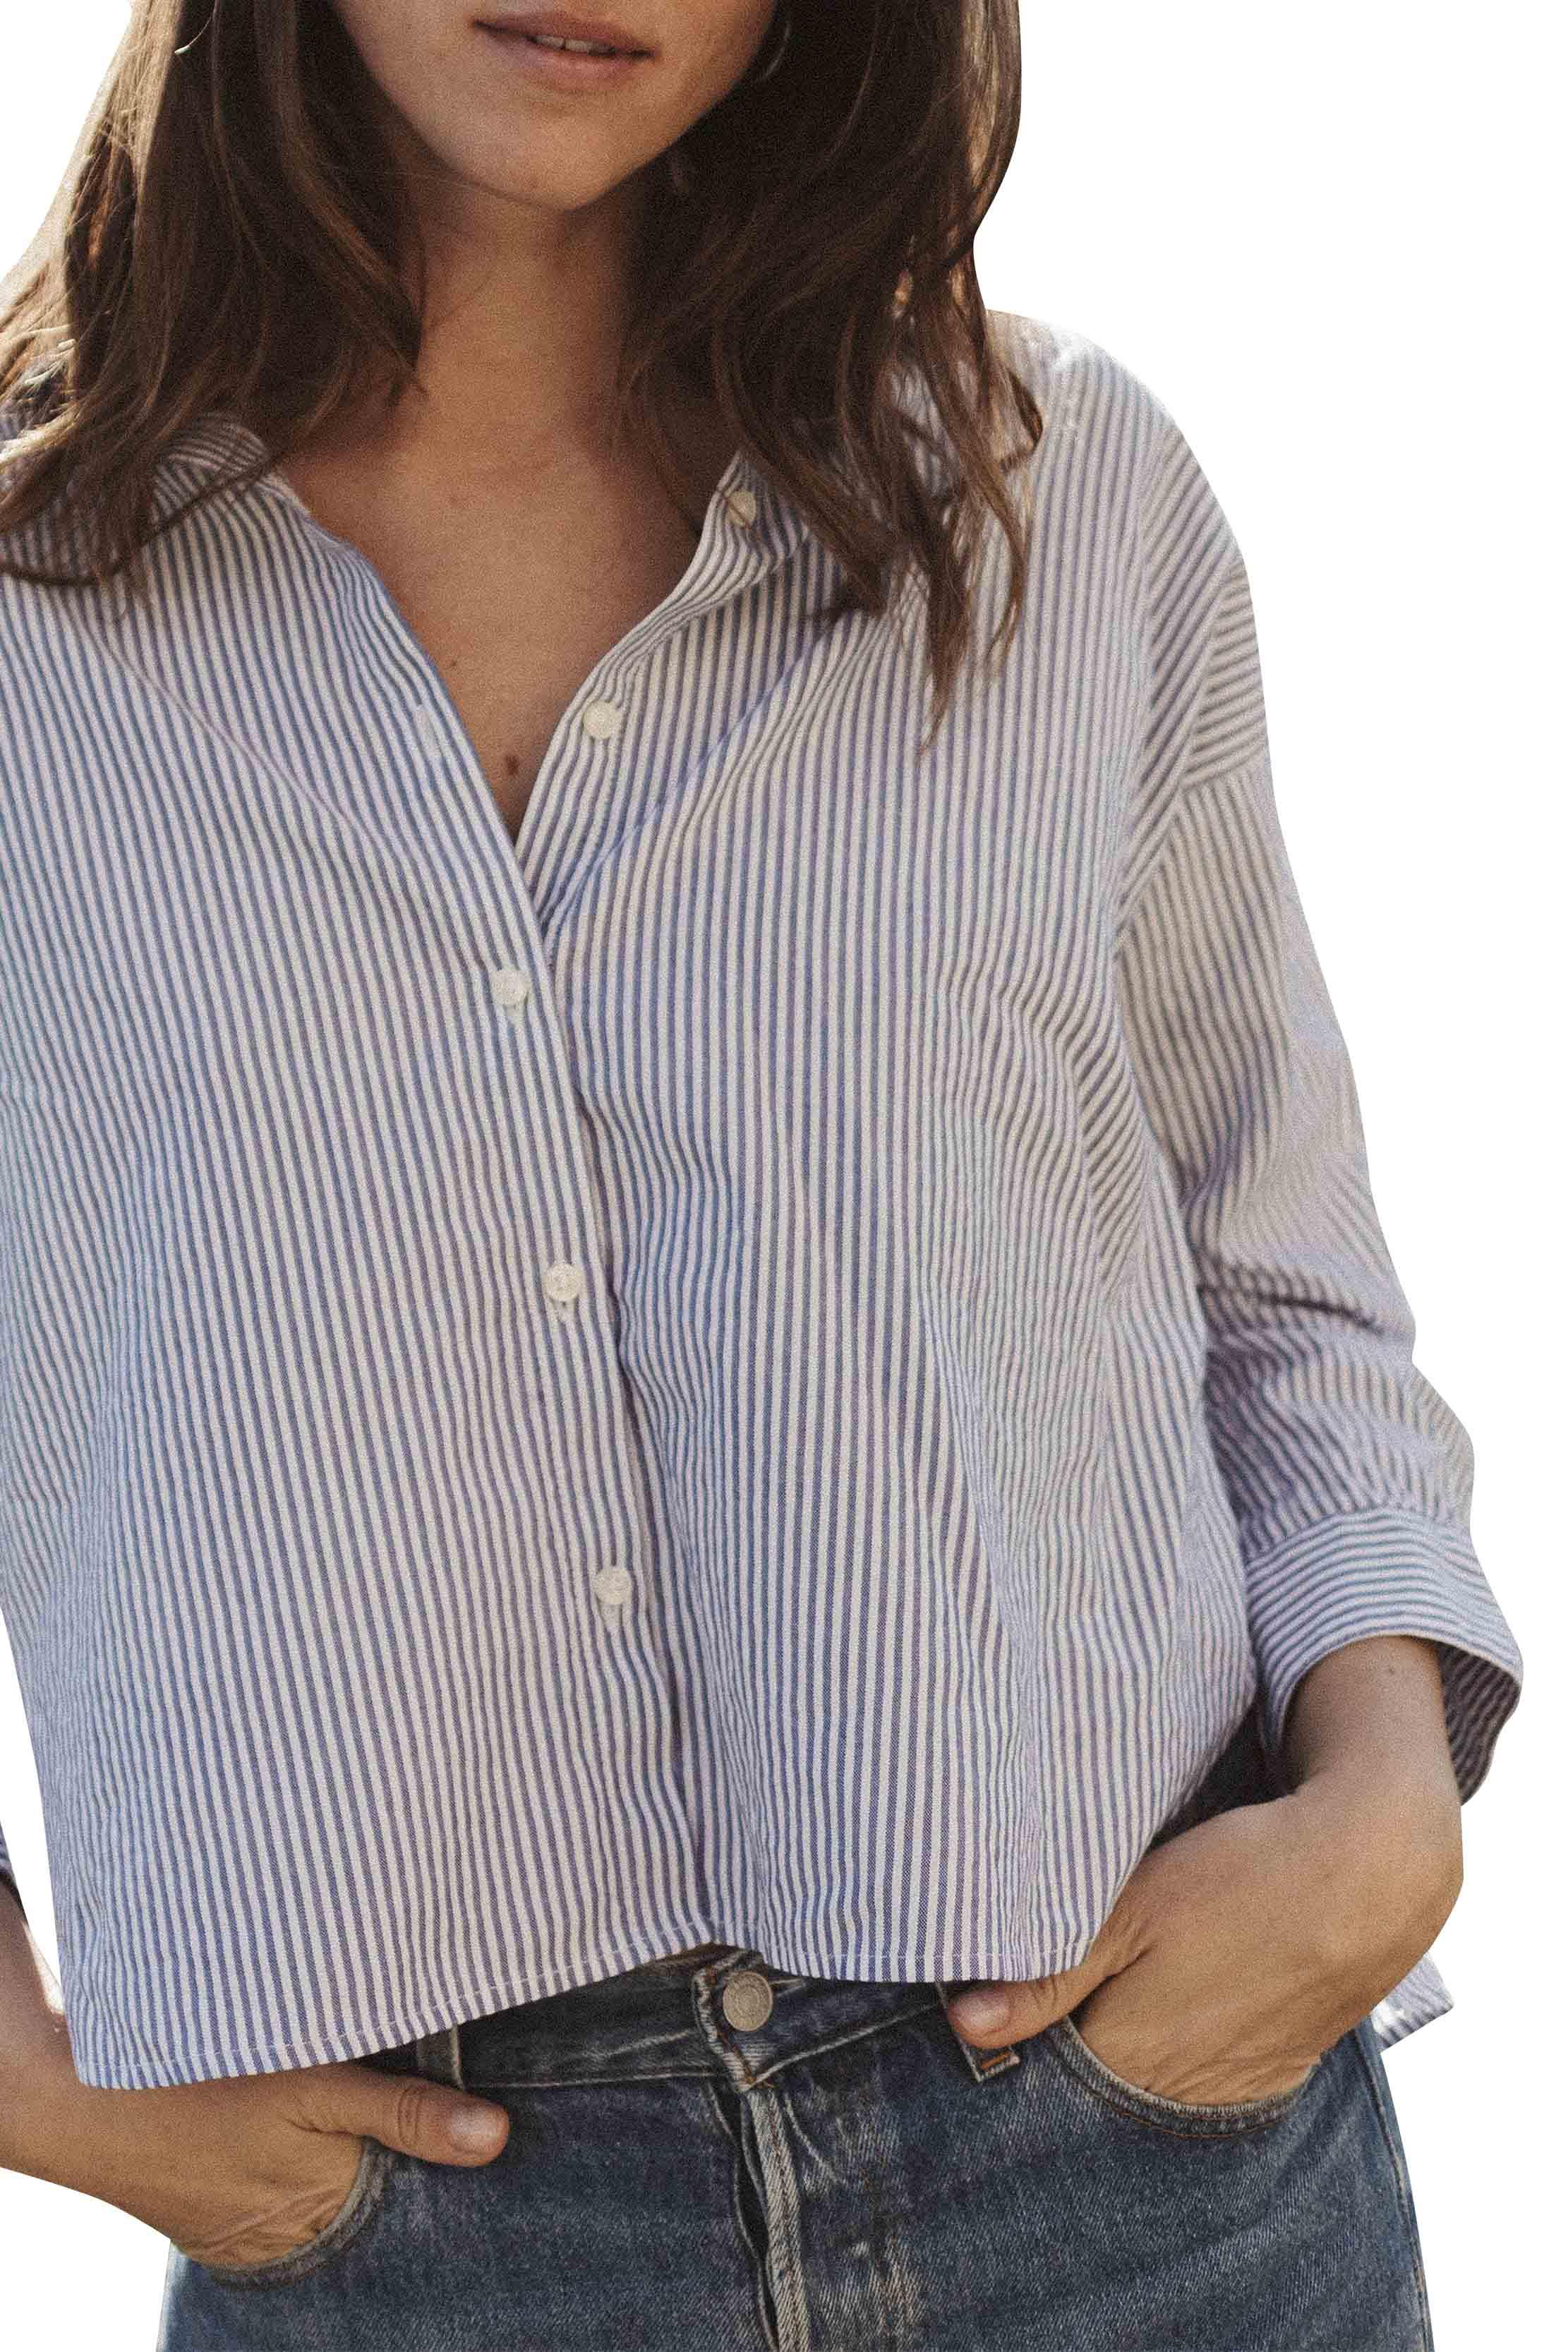 Sasha Oversize Shirt MARINERS STRIPE by Trovata - 1